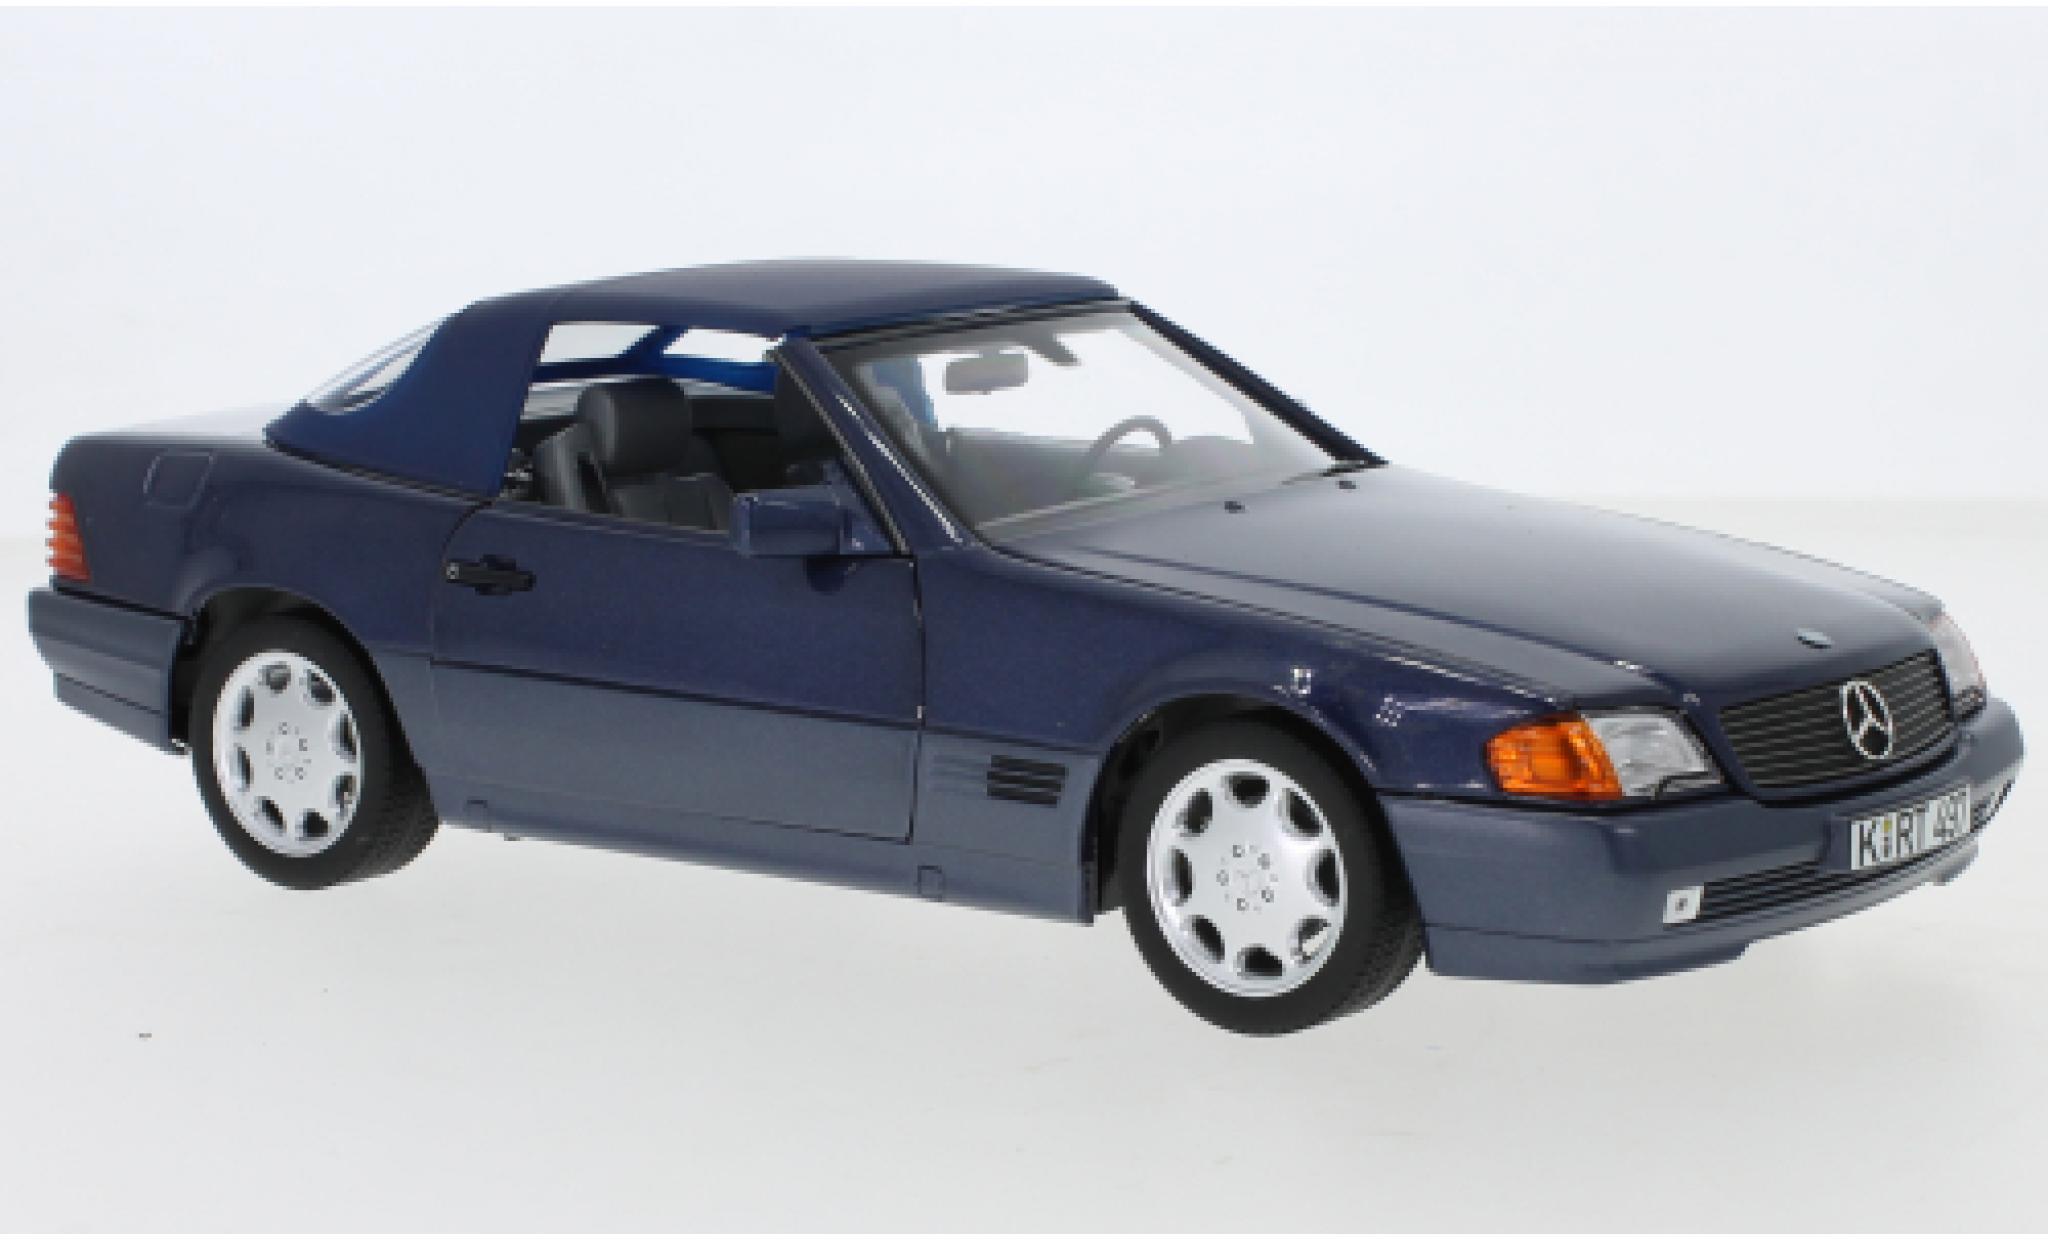 Mercedes 500 1/18 Norev SL (R129) metallise bleue 1989